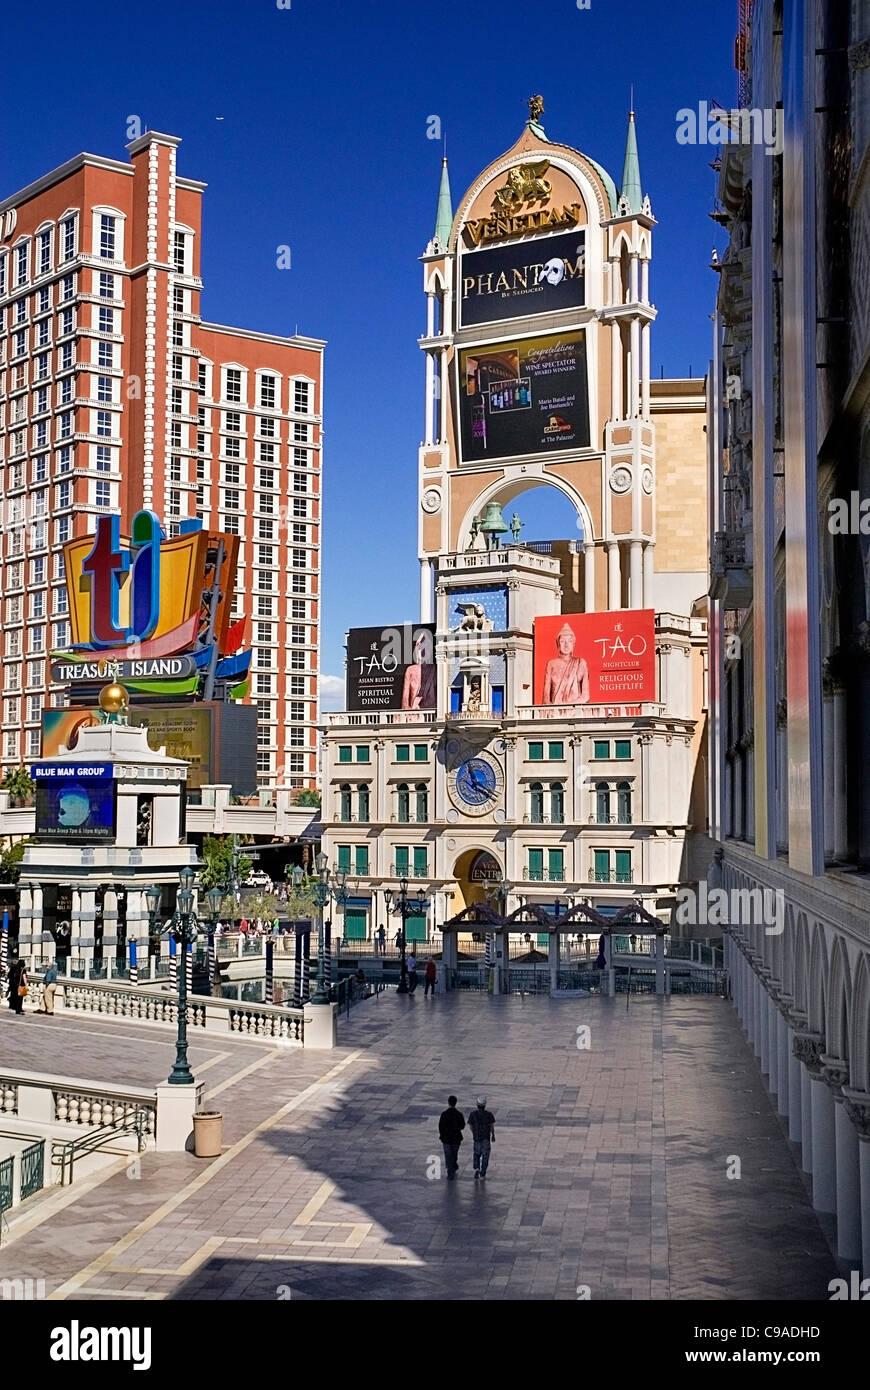 USA, Nevada, Las Vegas, The Strip, entrance to the Venetian hotel and casino. - Stock Image